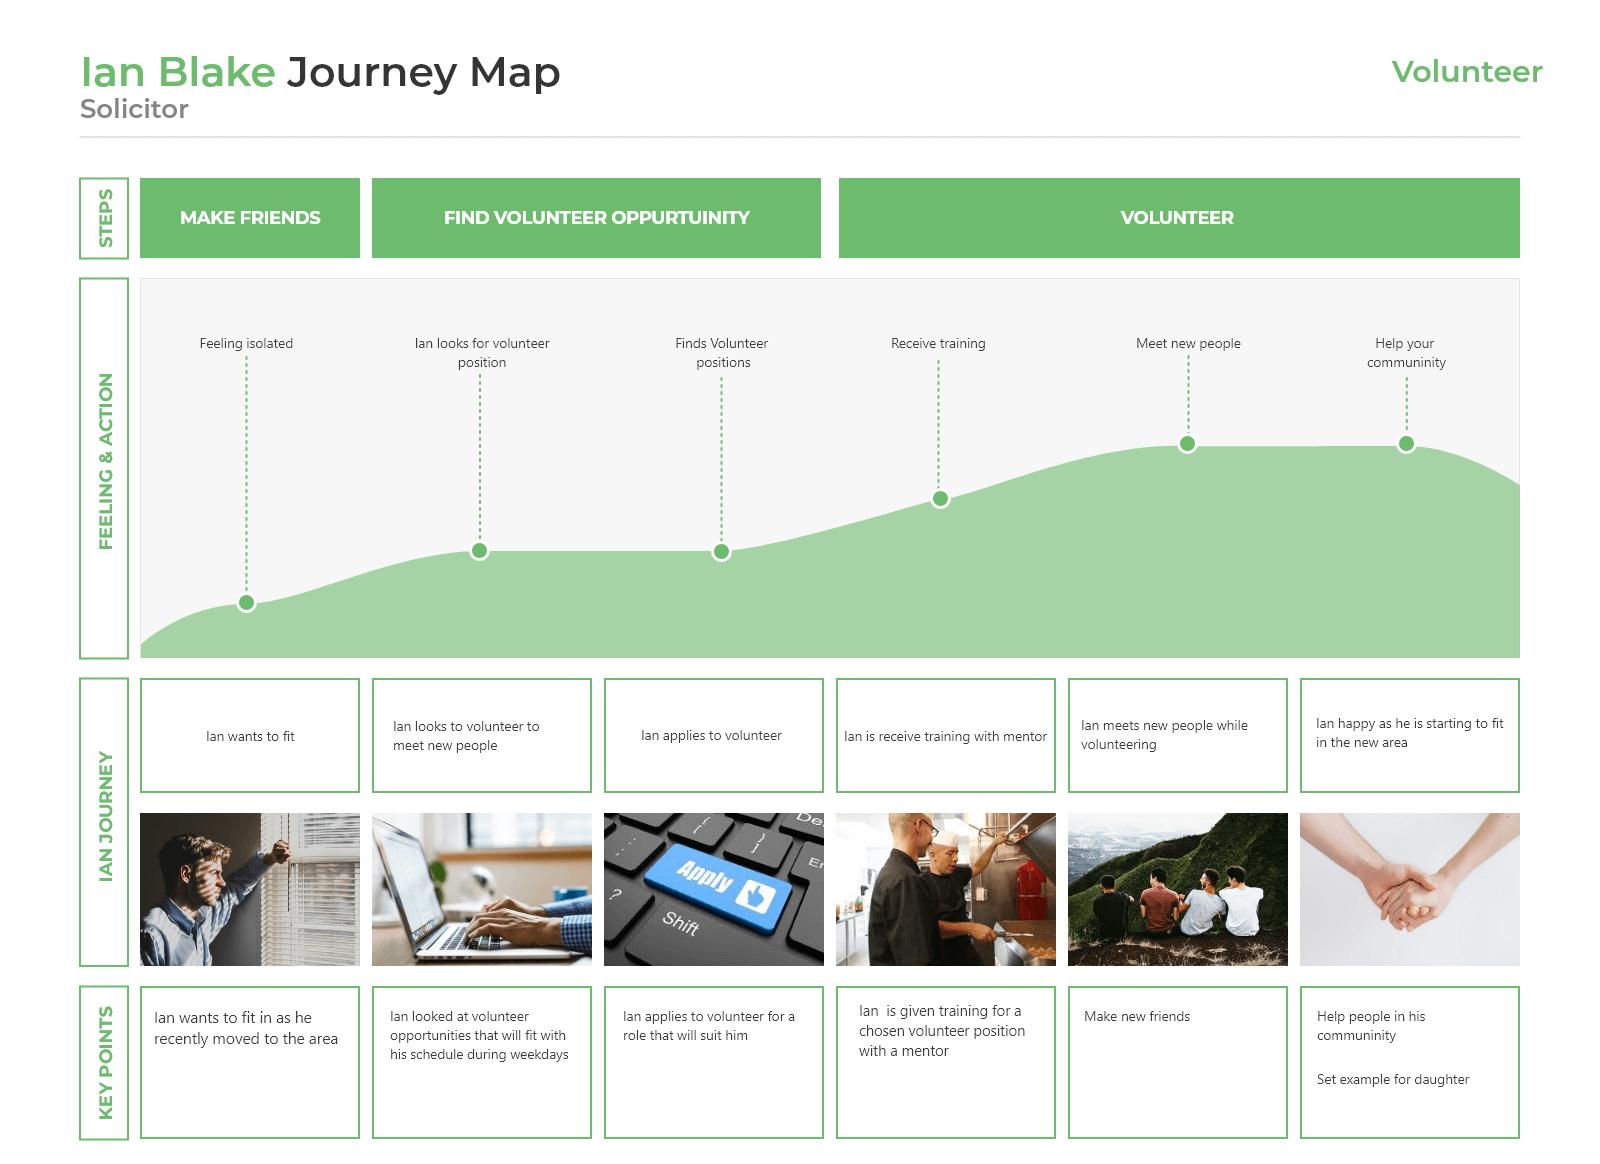 Ian journey